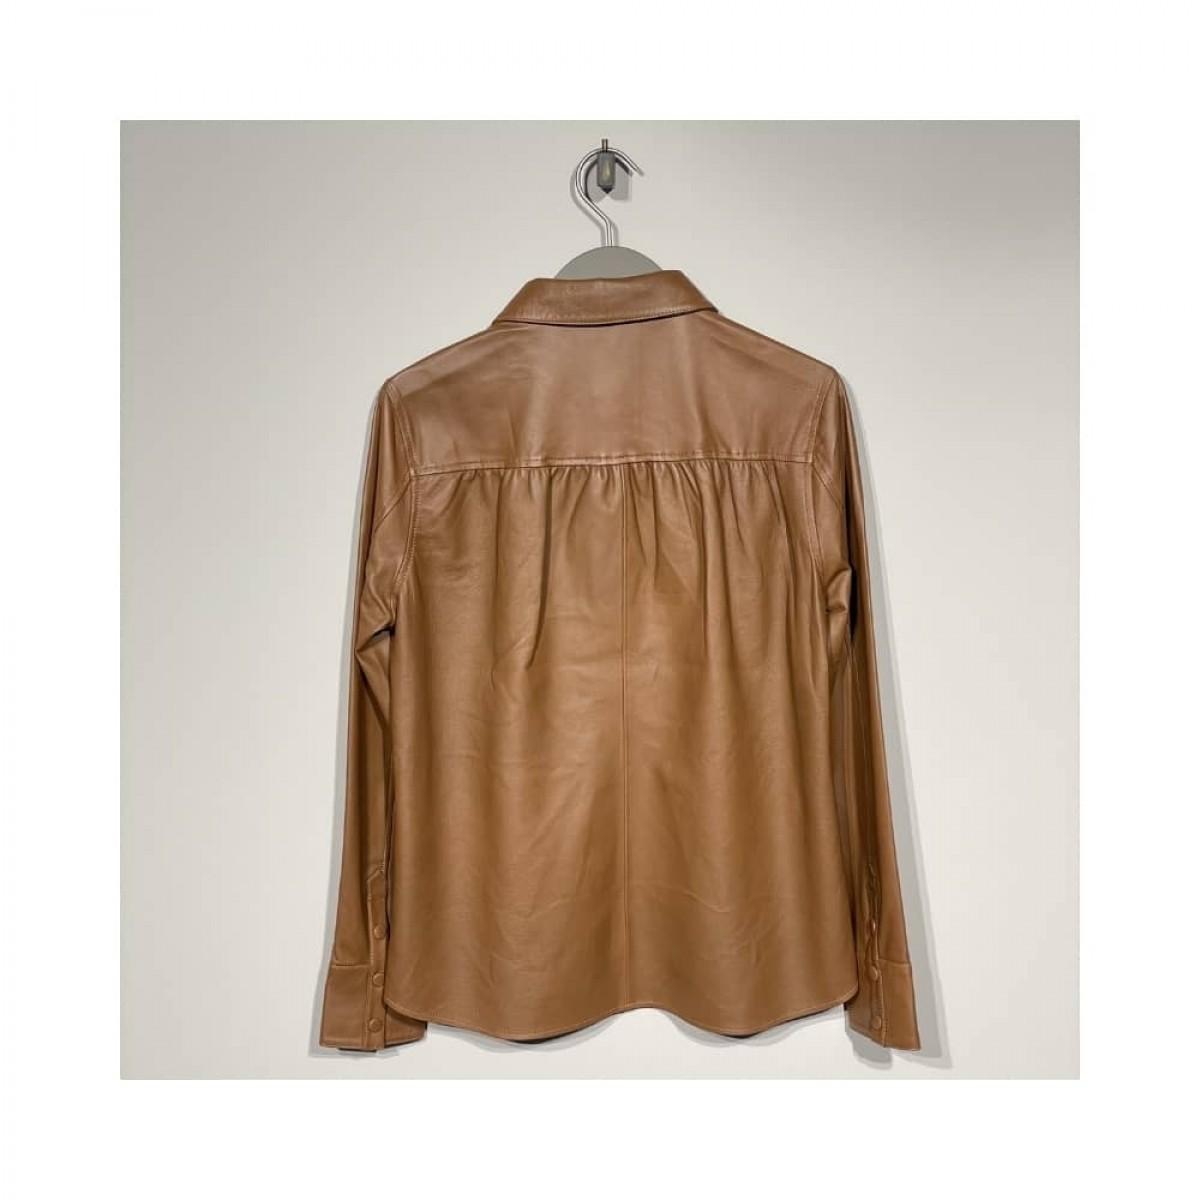 skind skjorte - cognac - ryg